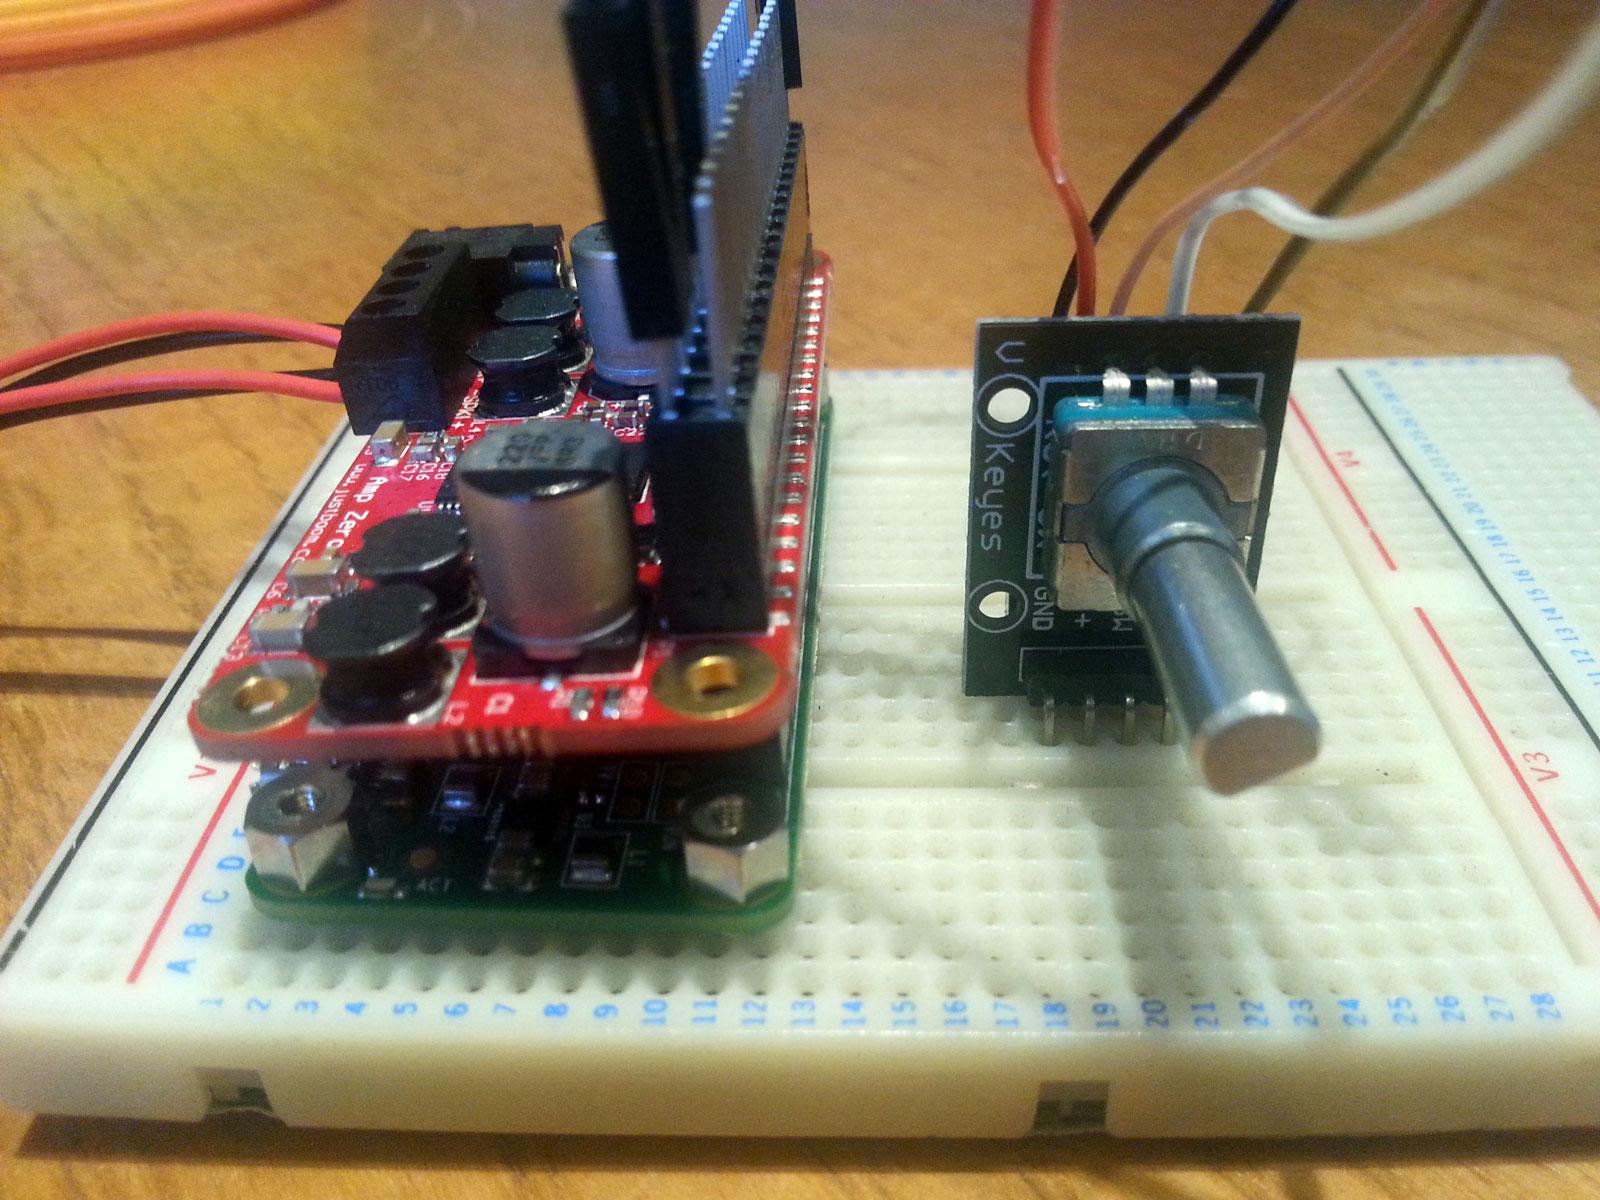 Rpi Andys Blog O Goodness Raspberry Pi How To Install Wiringpi Rotary Volume Control For The